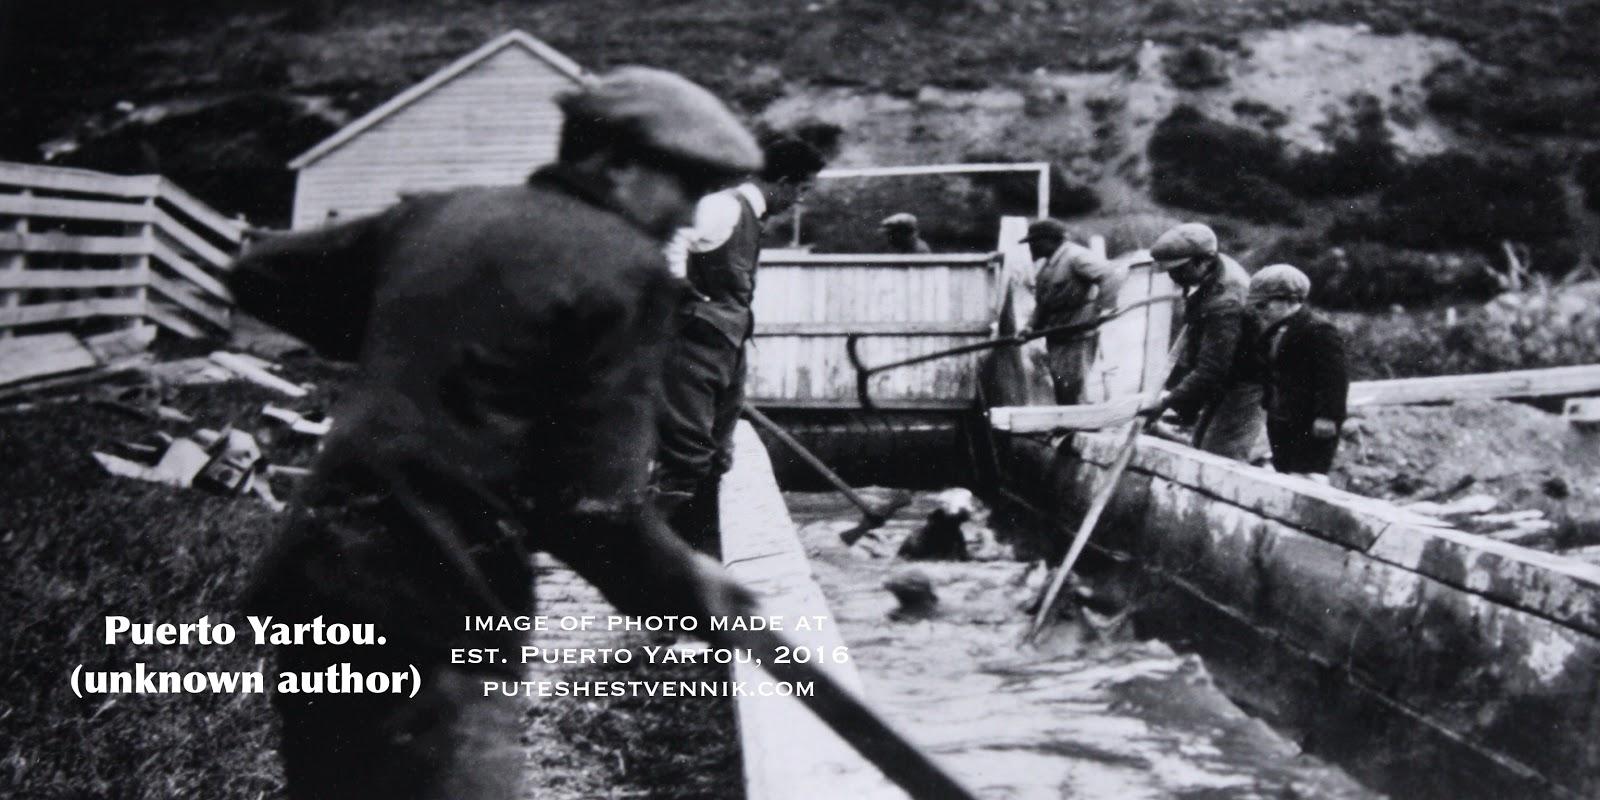 Люди у корыта на эстанции Пуэрто Яртоу